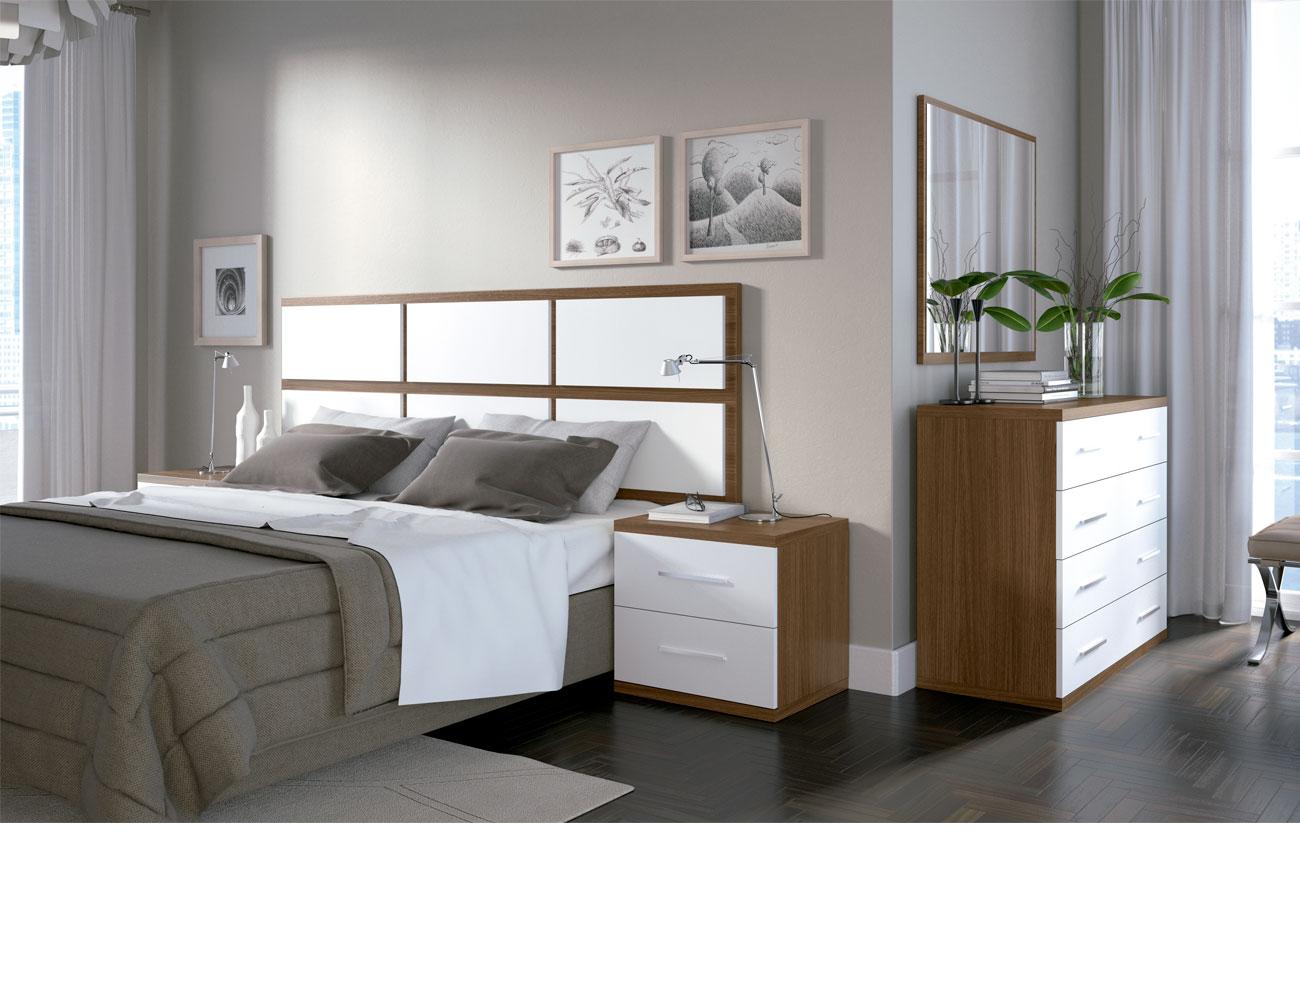 Dormitorio matrimonio moderno 33 nogal blanco